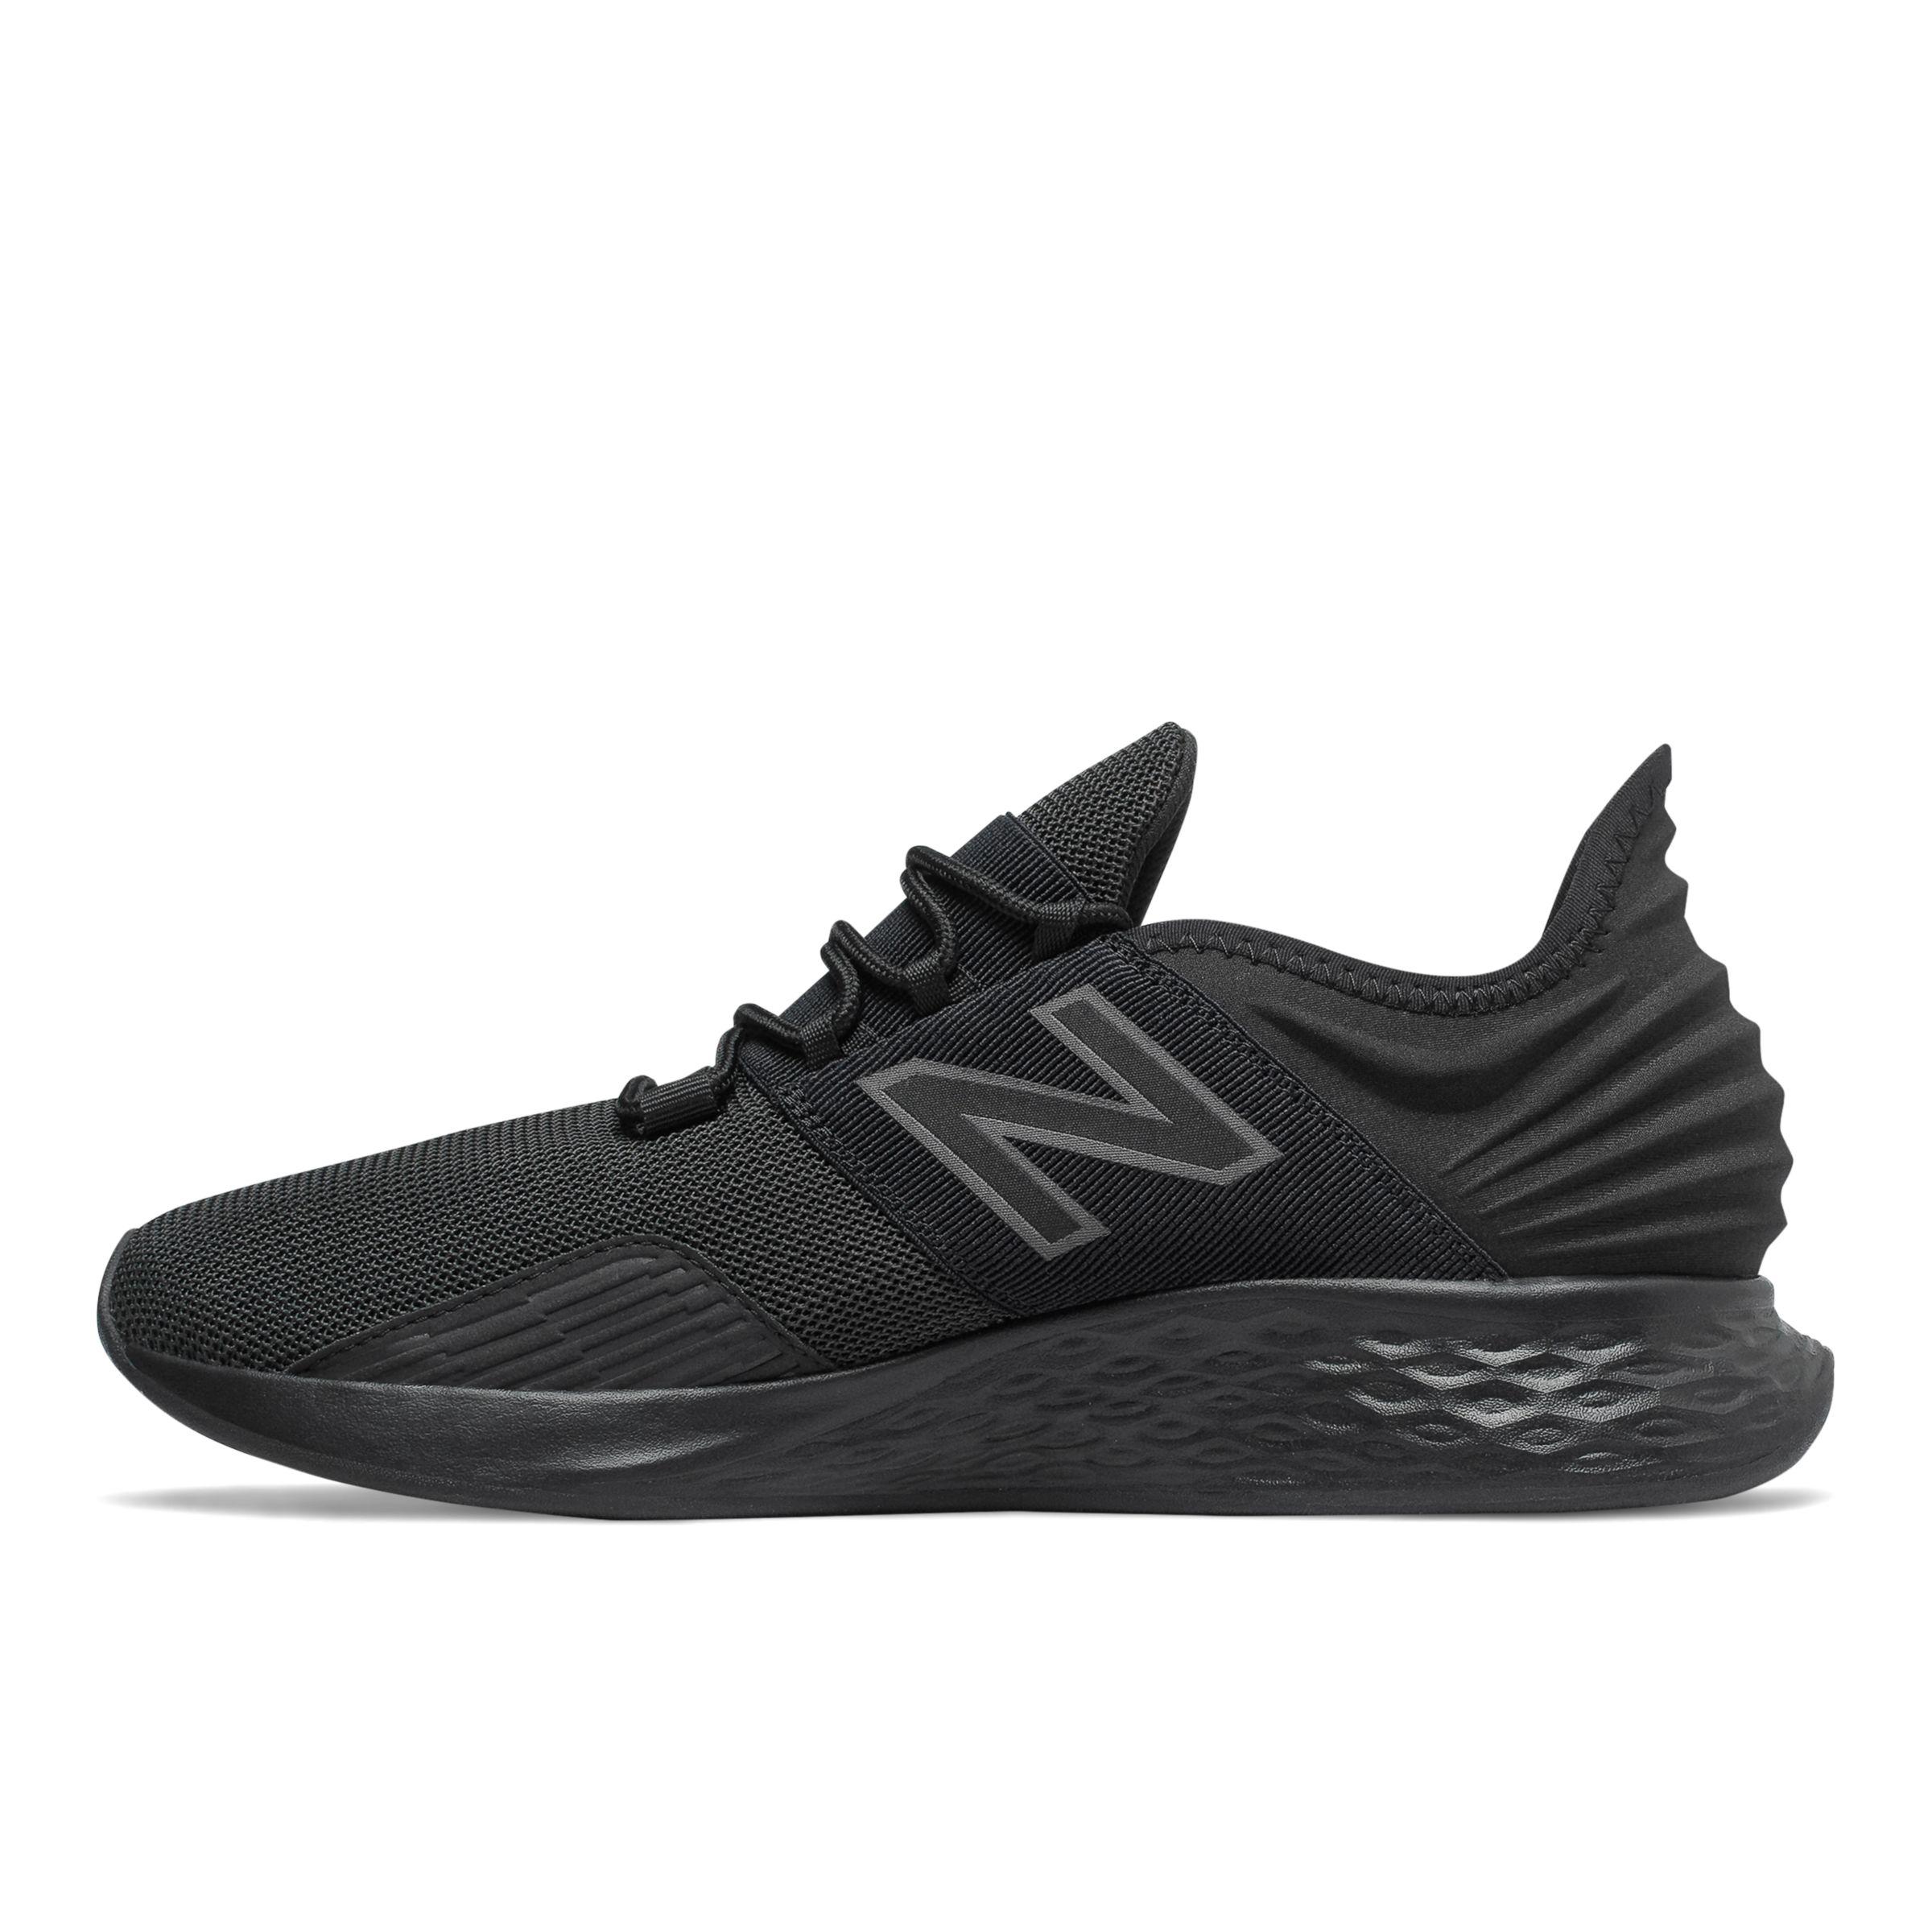 thumbnail 7 - New-Balance-Fresh-Foam-Roav-Men-039-s-Running-Sport-Lifestyle-Shoes